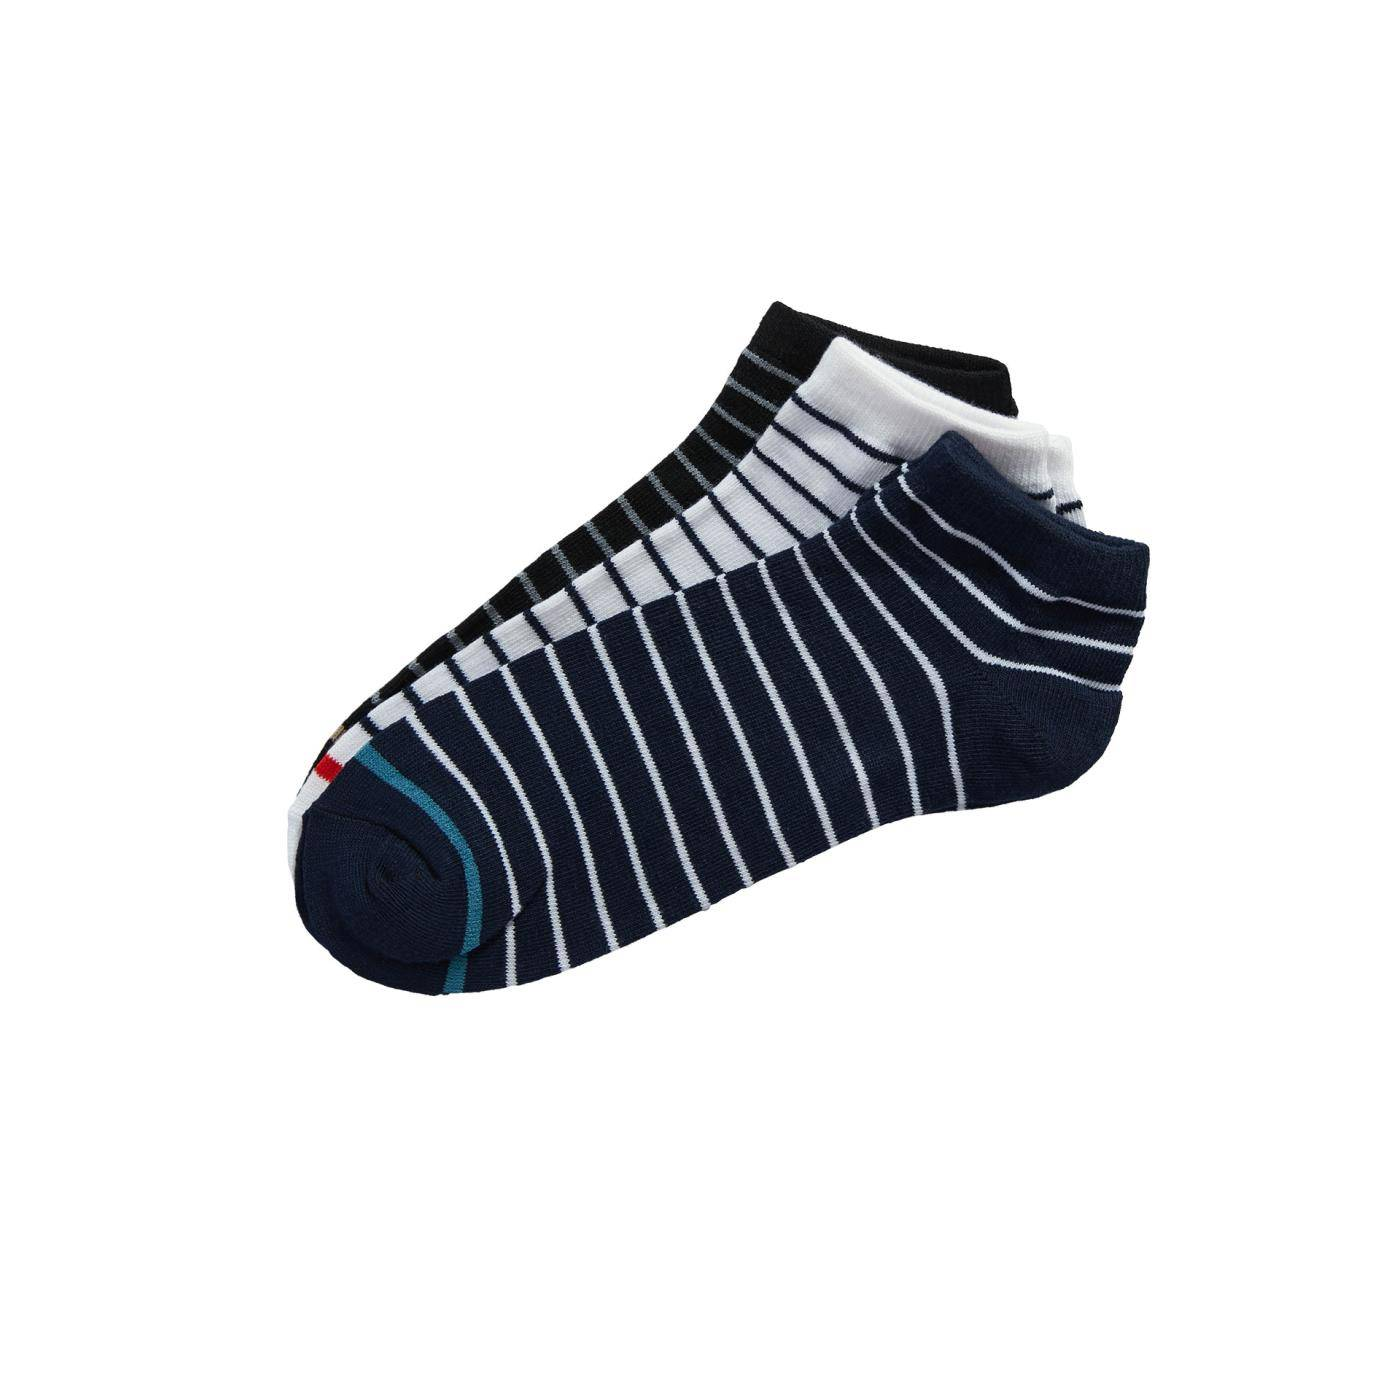 Celestino Σετ με 3 ζευγάρια ριγέ ανδρικές κάλτσες  - Μιχ 1 - Grootte: One Size